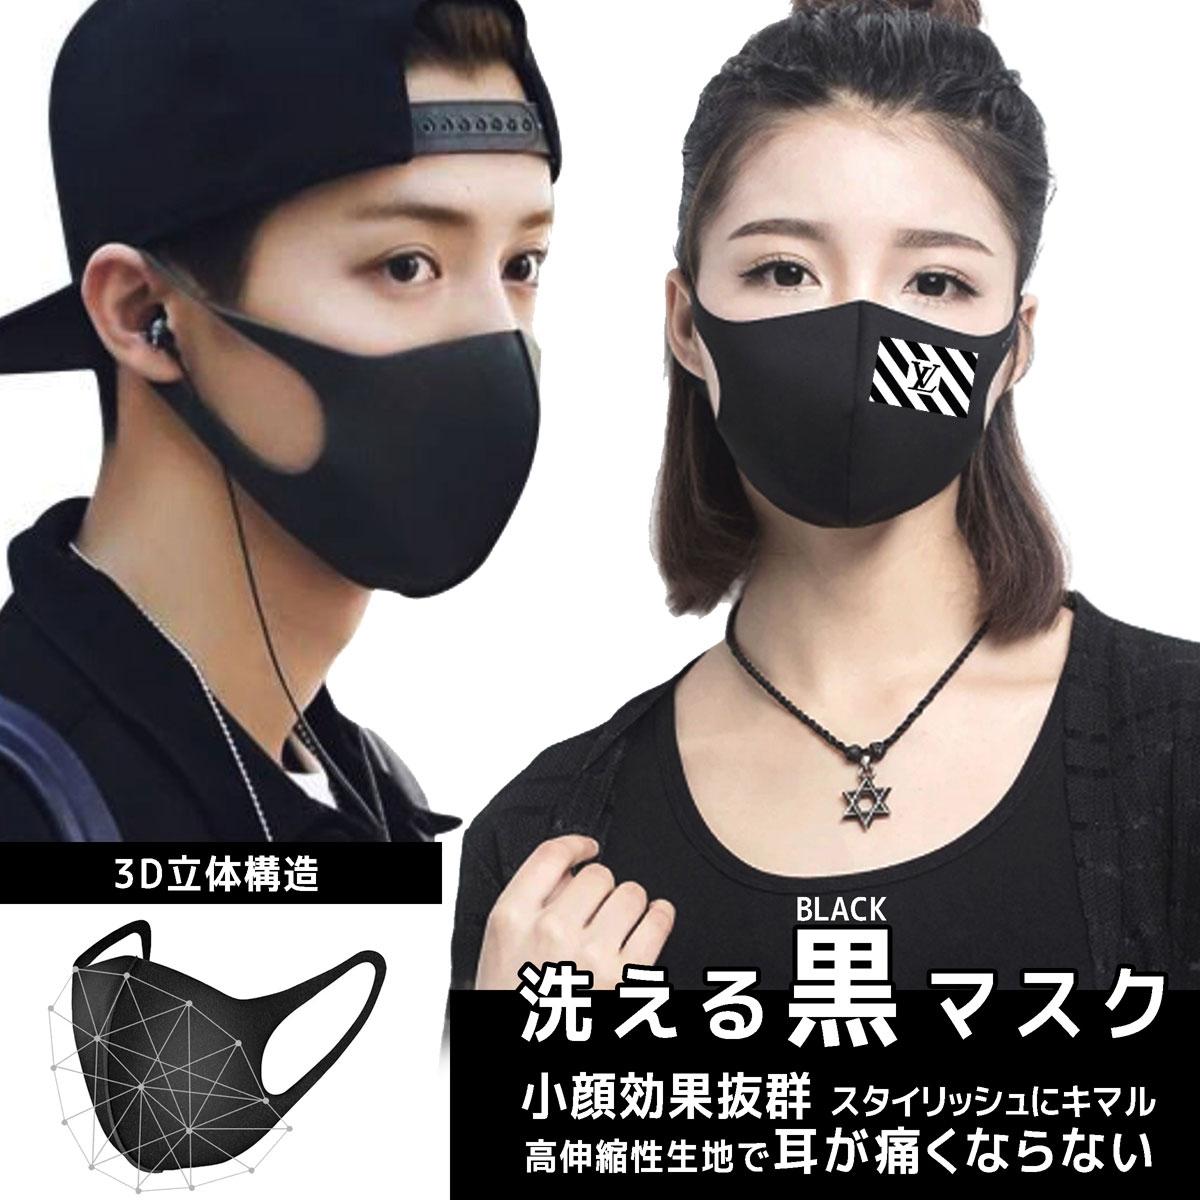 Louis Vuittonヴィトン風マスク子供用 大人用 3Dマスク